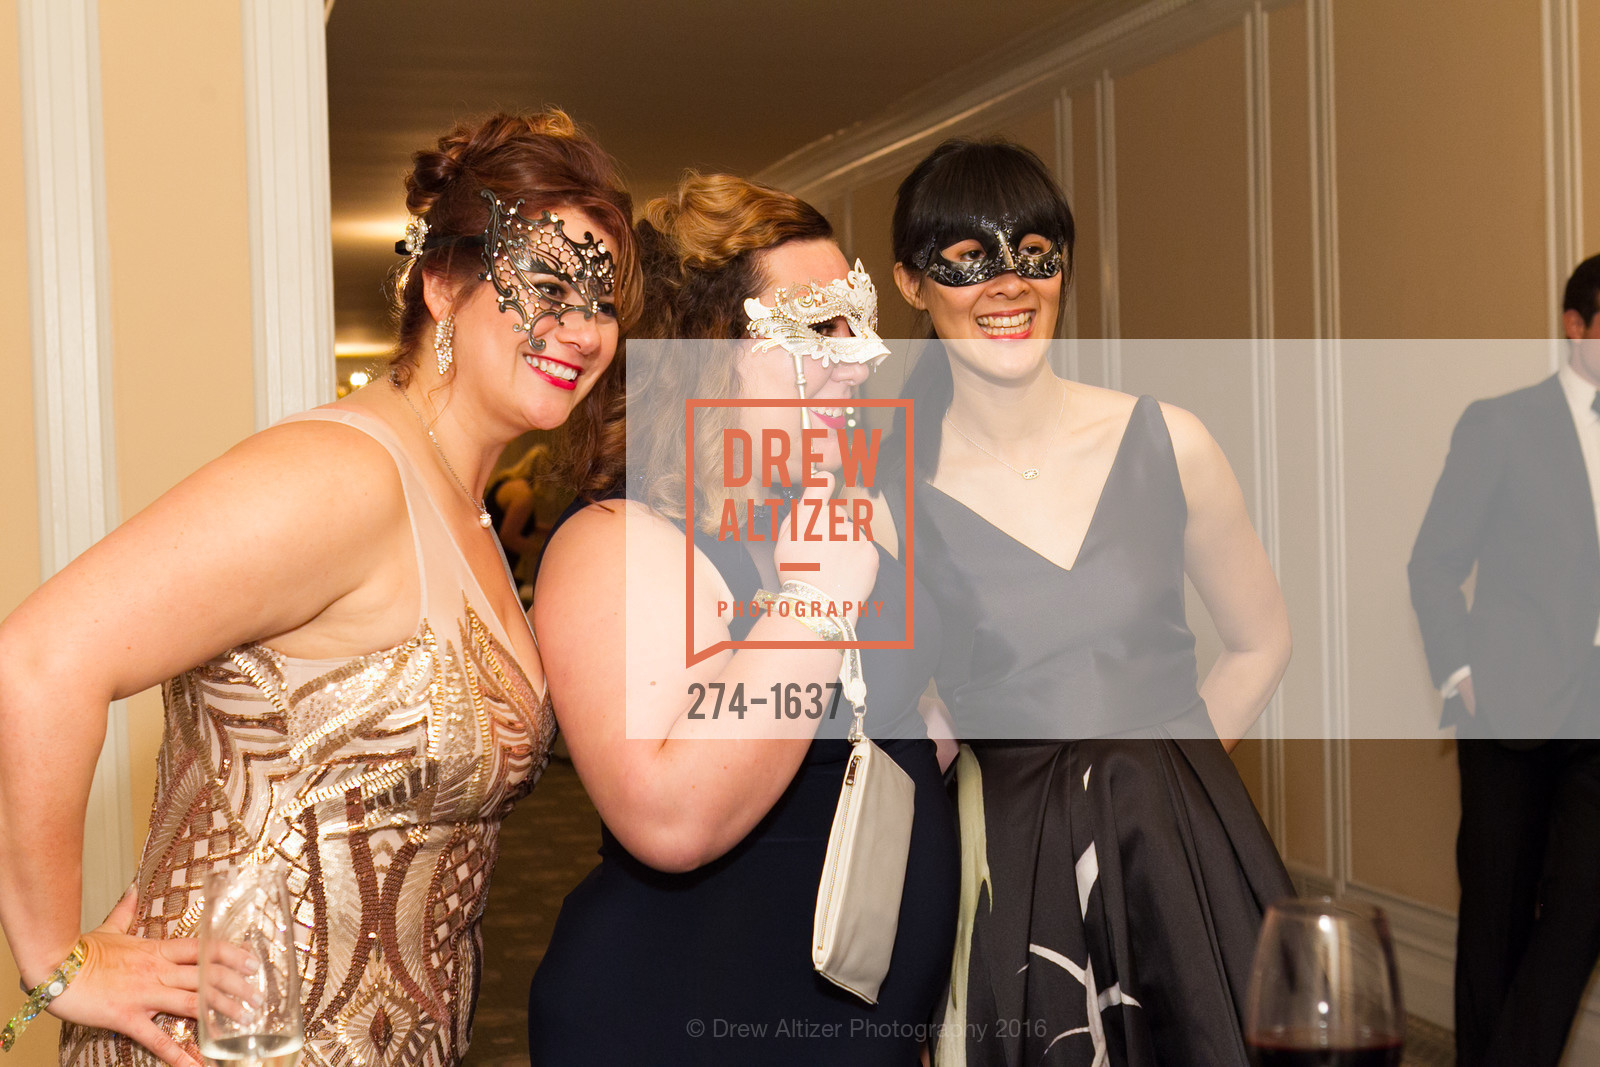 Xanadu Bruggers, Tinna Ho, Spinsters Holiday event, Metropolitan Club. 640 Sutter St, San Francisco, CA 94102, December 10th, 2016